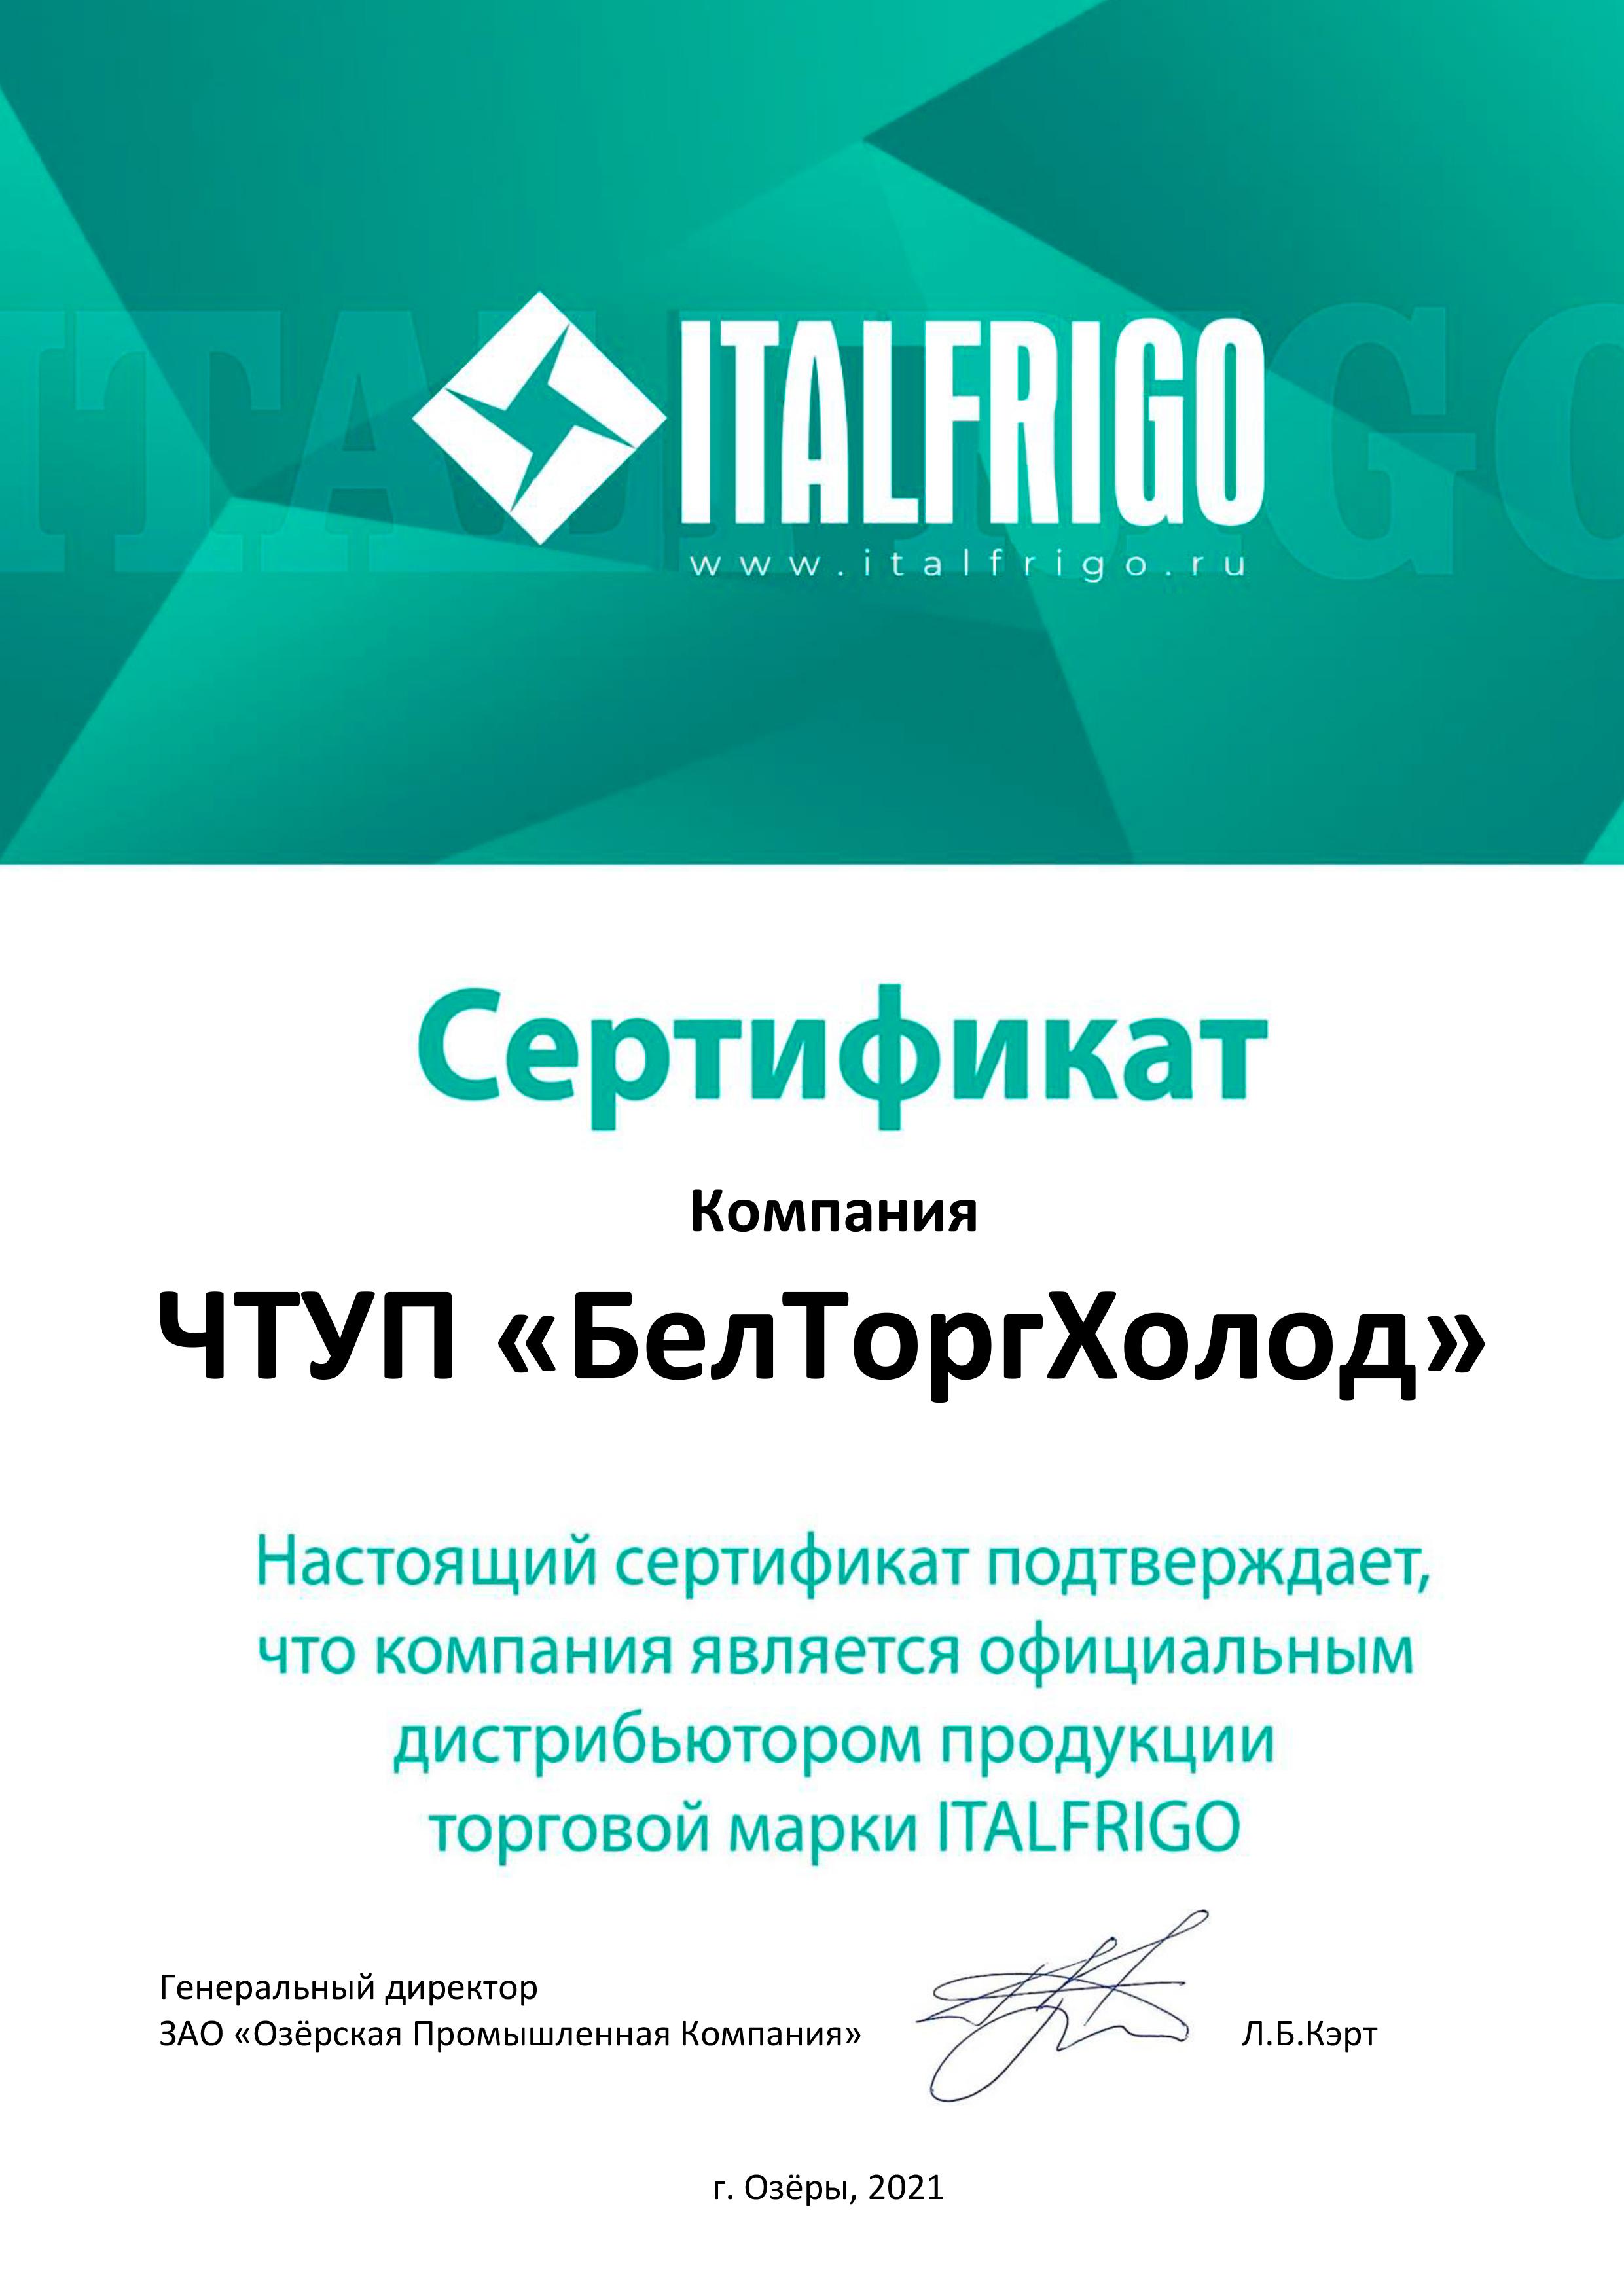 Сертификат Италфриго (Italfrigo)